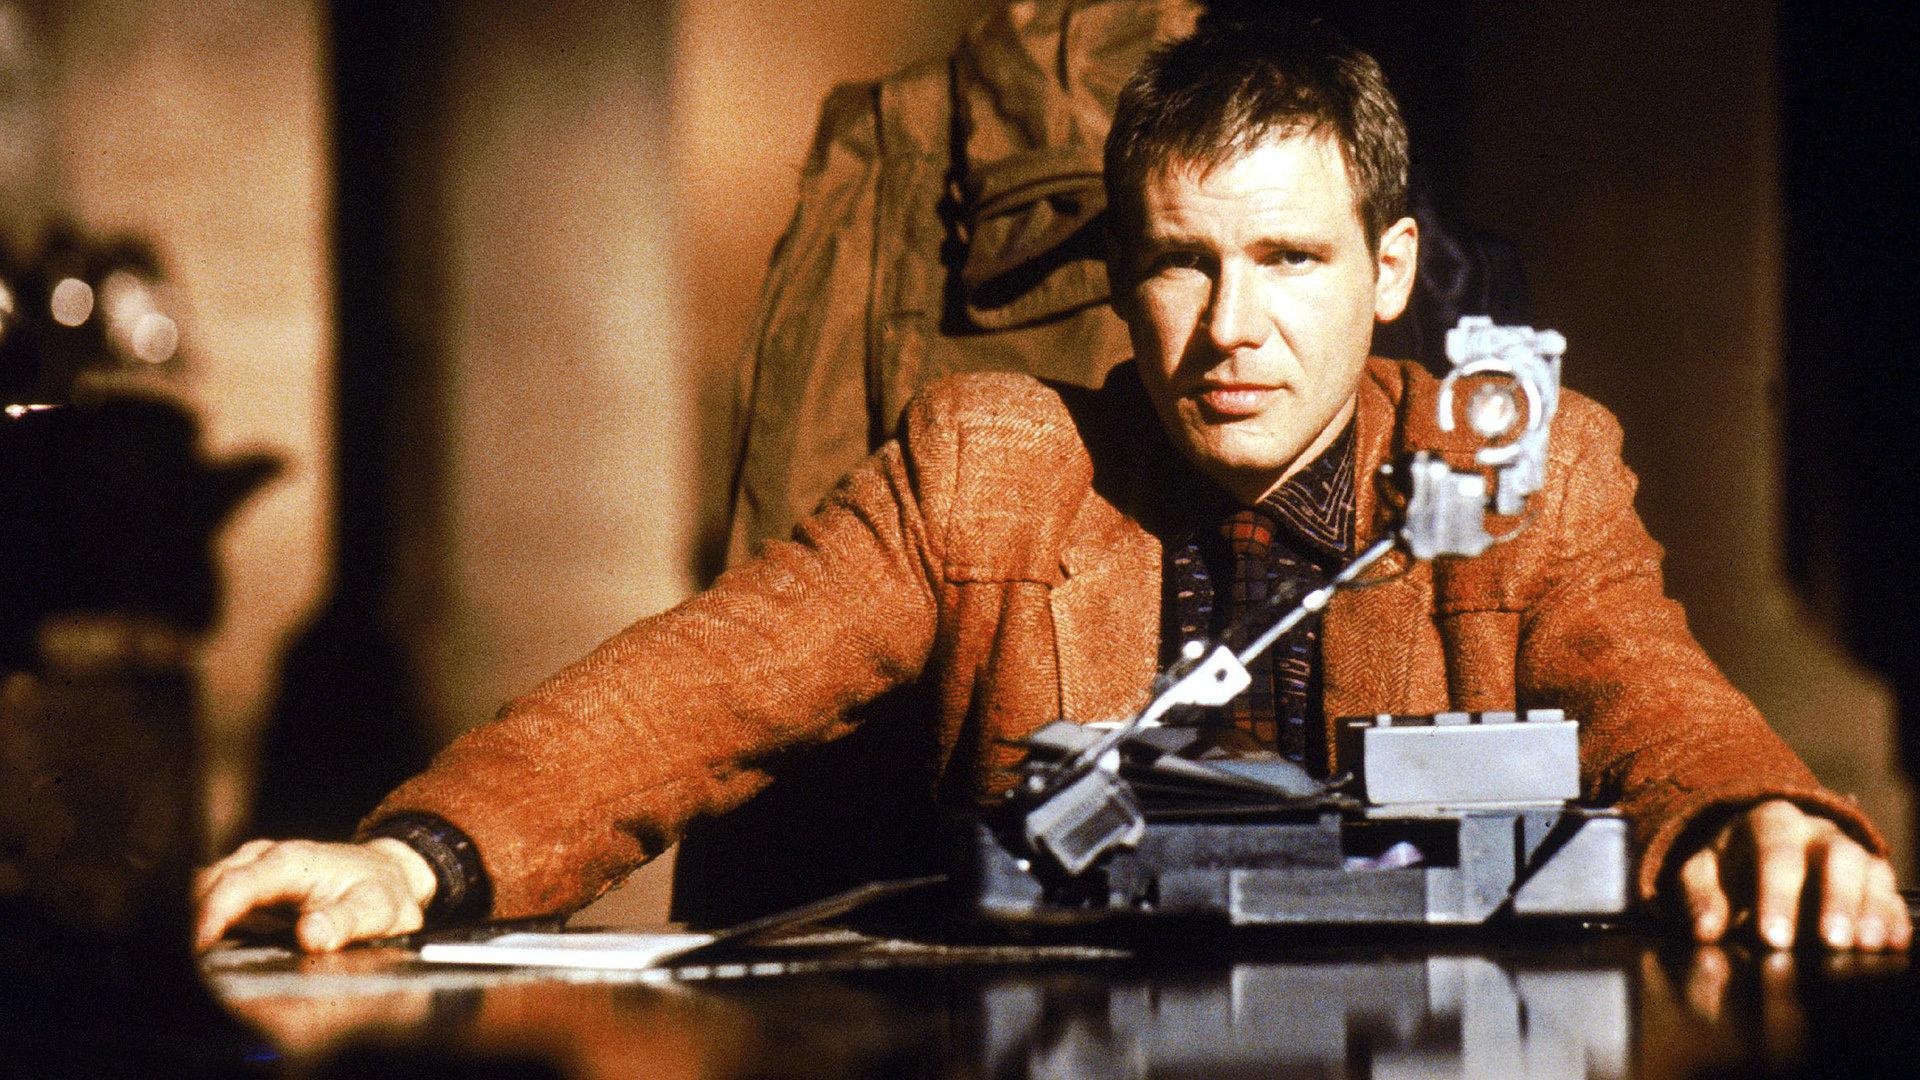 Jared Leto Blade Runner MovieSpoon.com